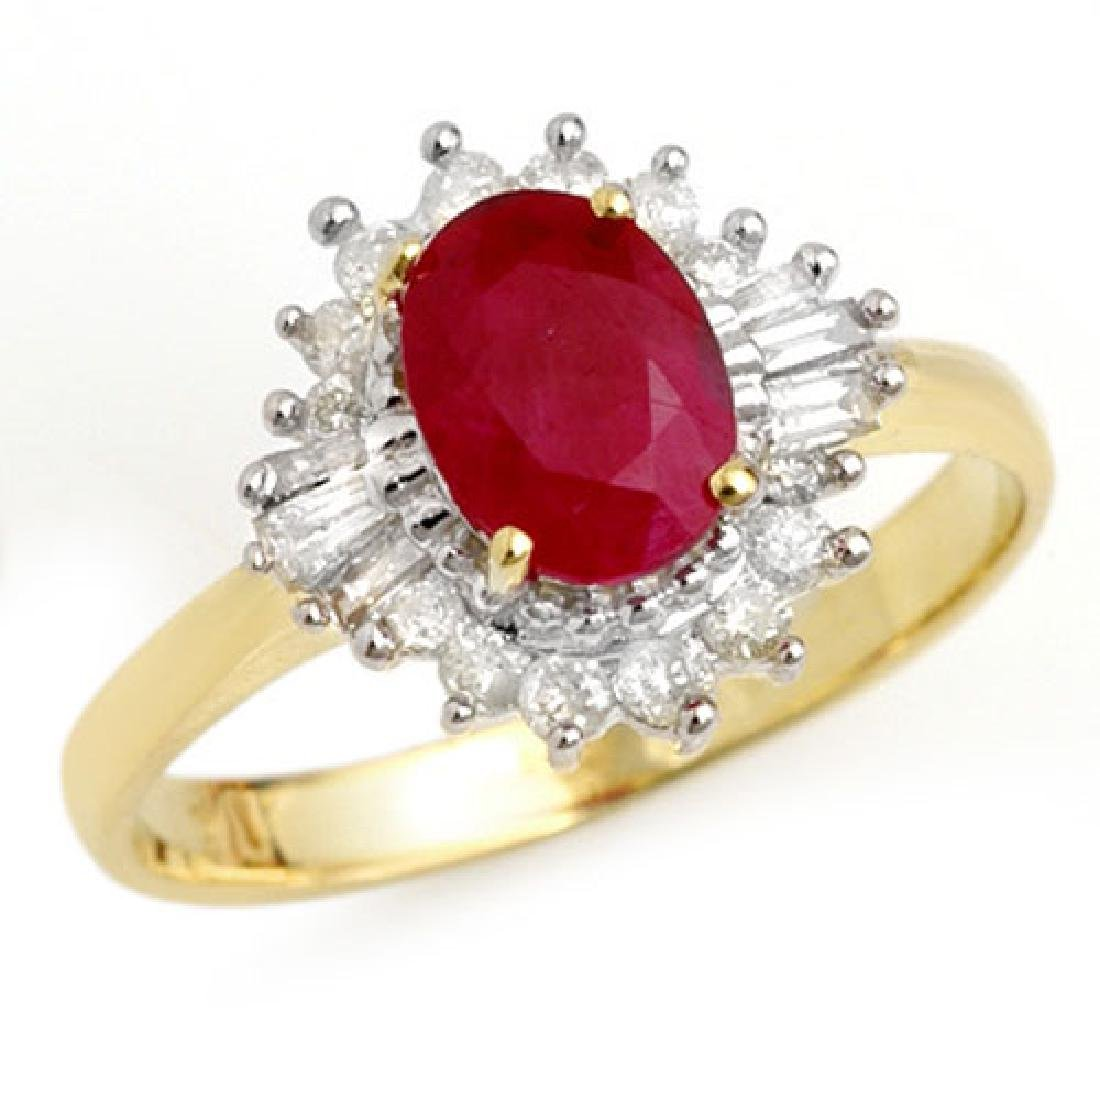 1.55 CTW Ruby & Diamond Ring 10K Yellow Gold